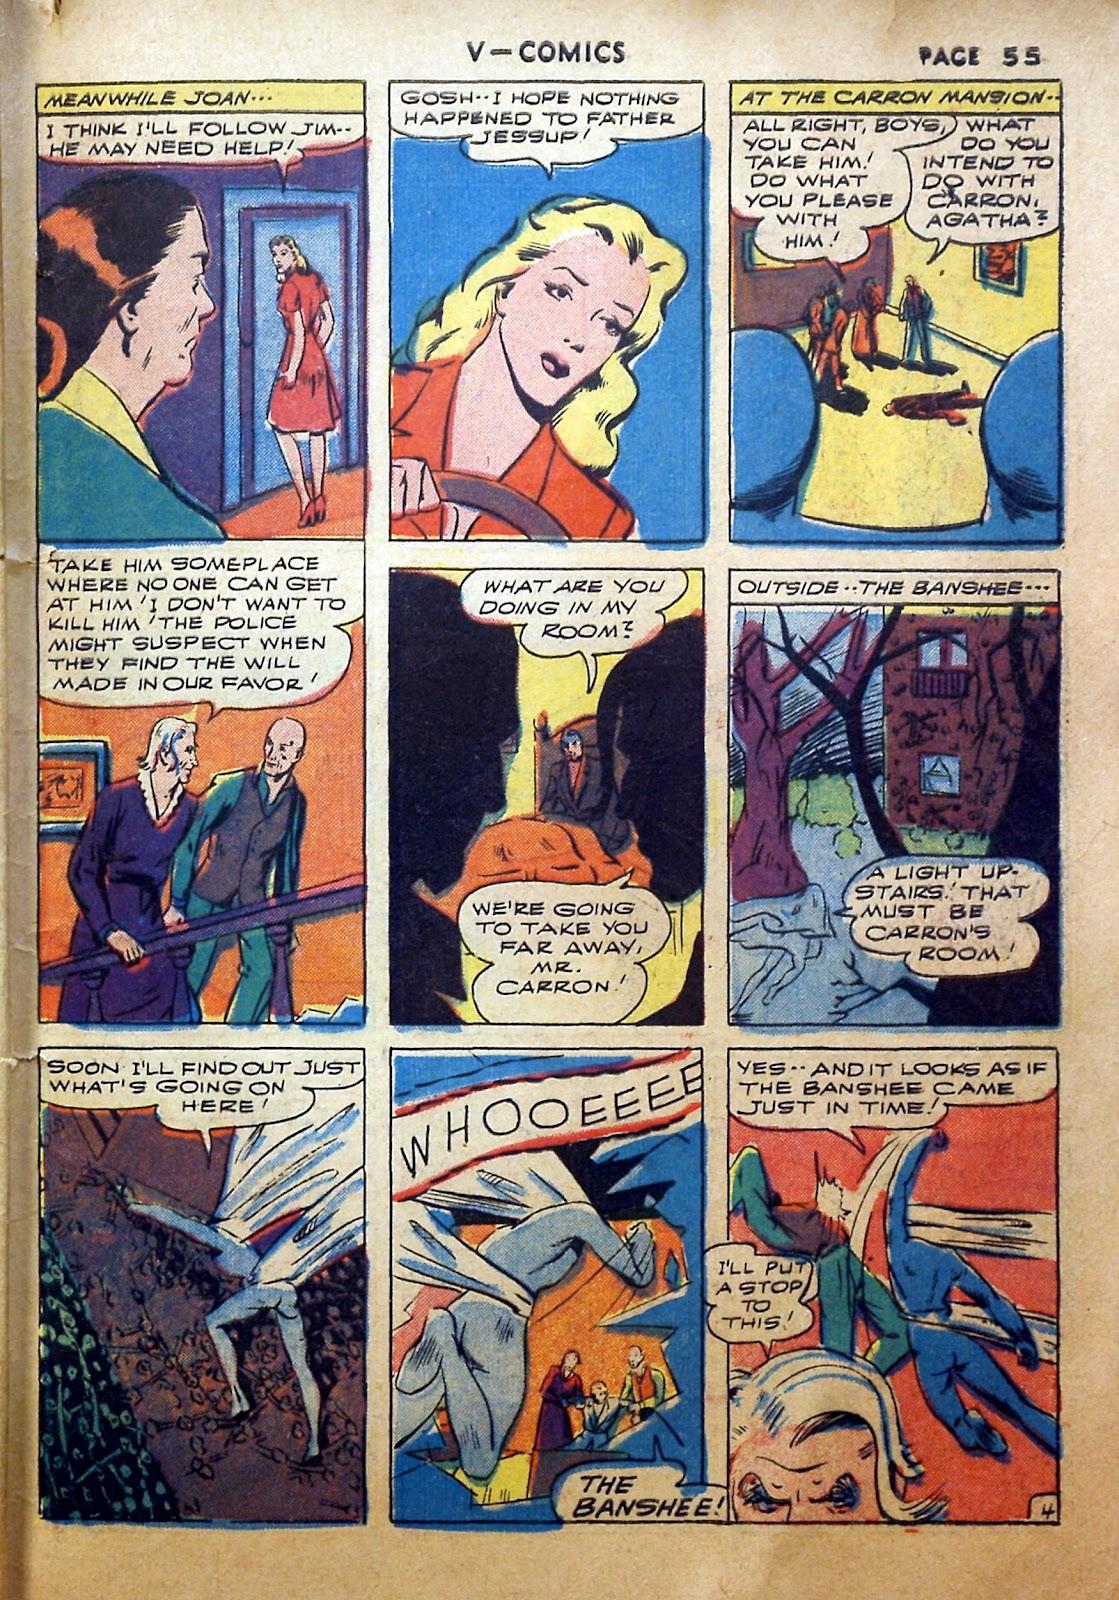 Read online V...- Comics comic -  Issue #2 - 56